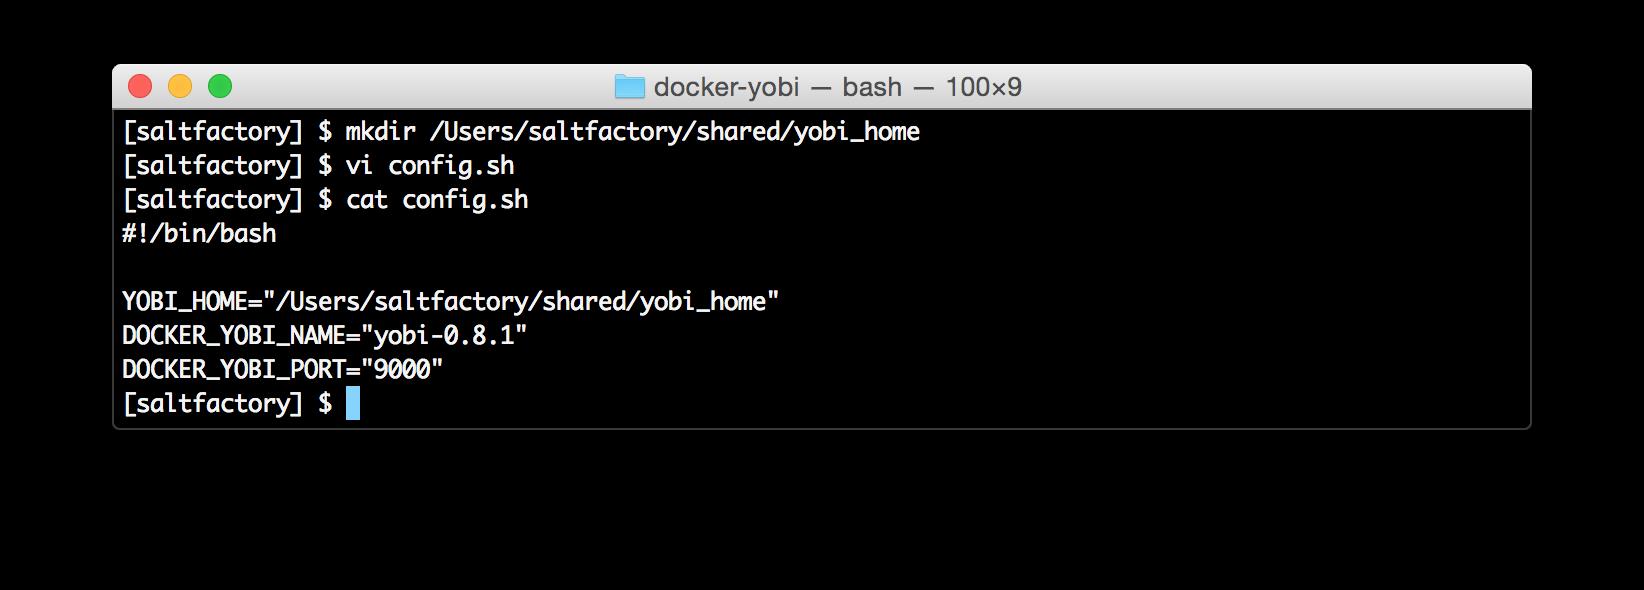 setting YOBI_HOME